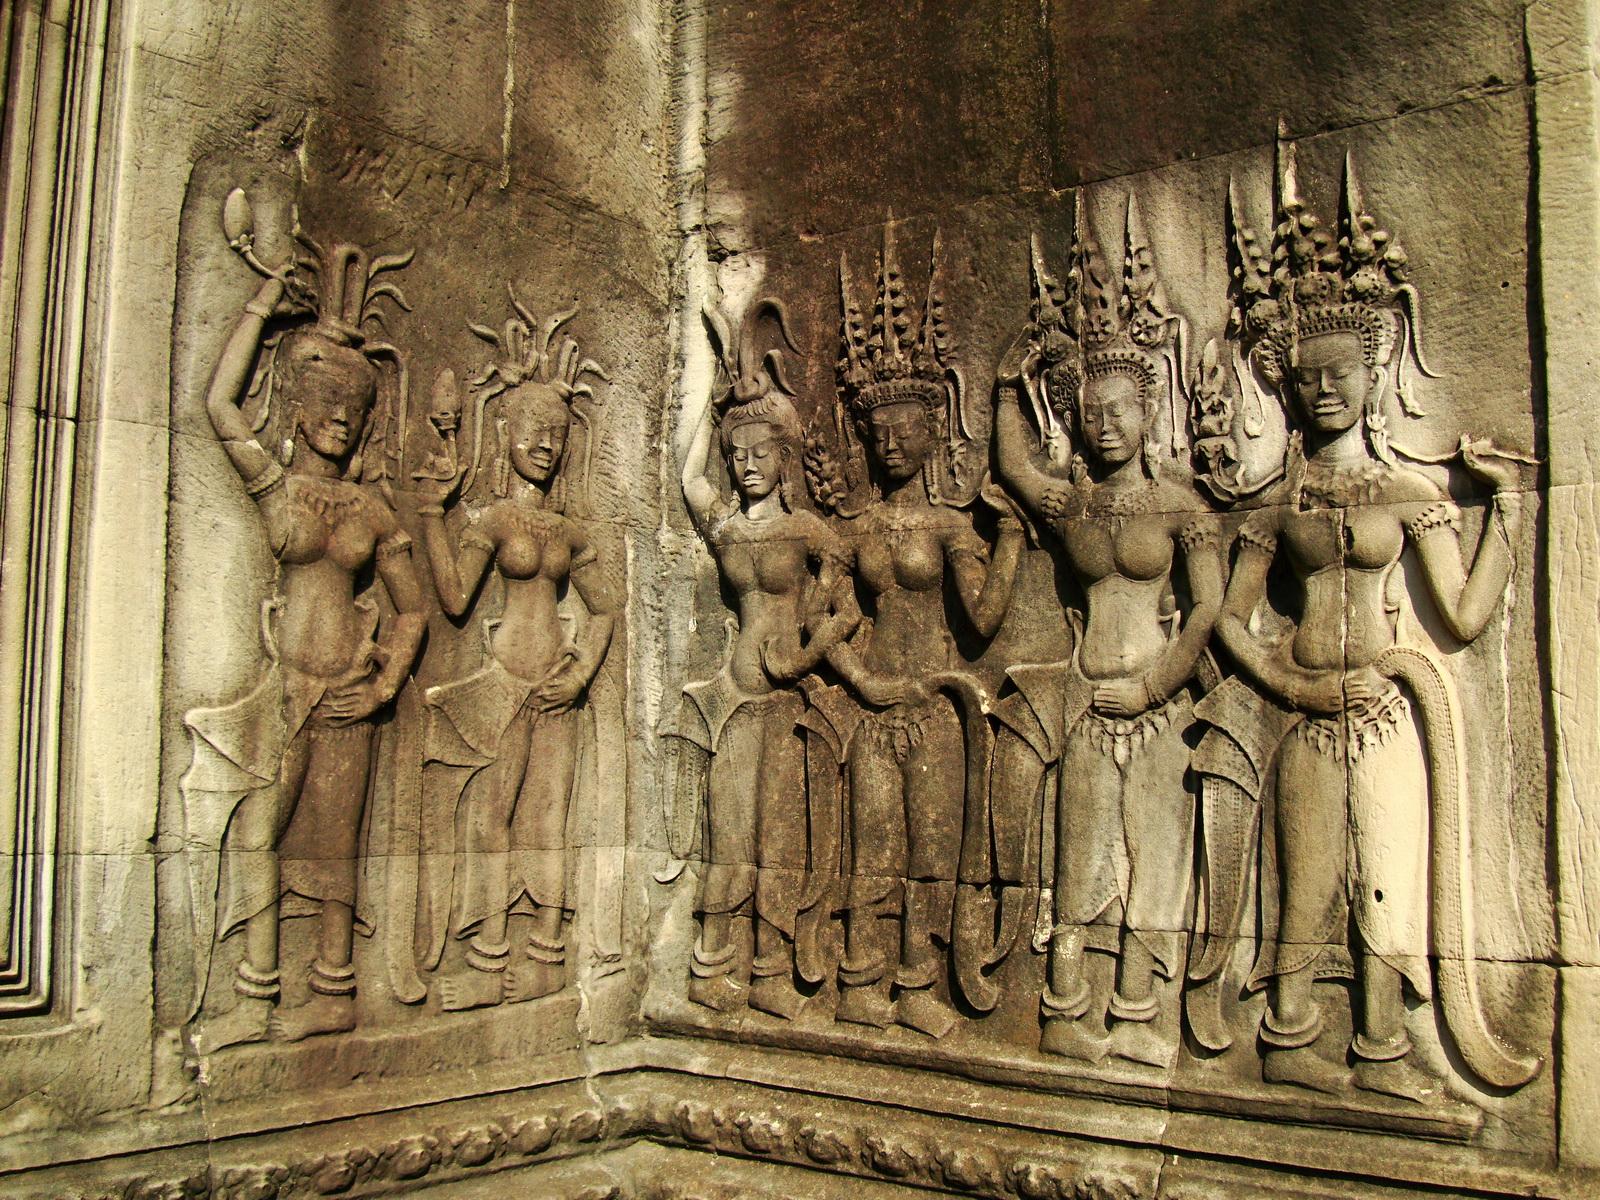 Angkor Wat Khmer architecture bas relief devatas Siem Reap 47